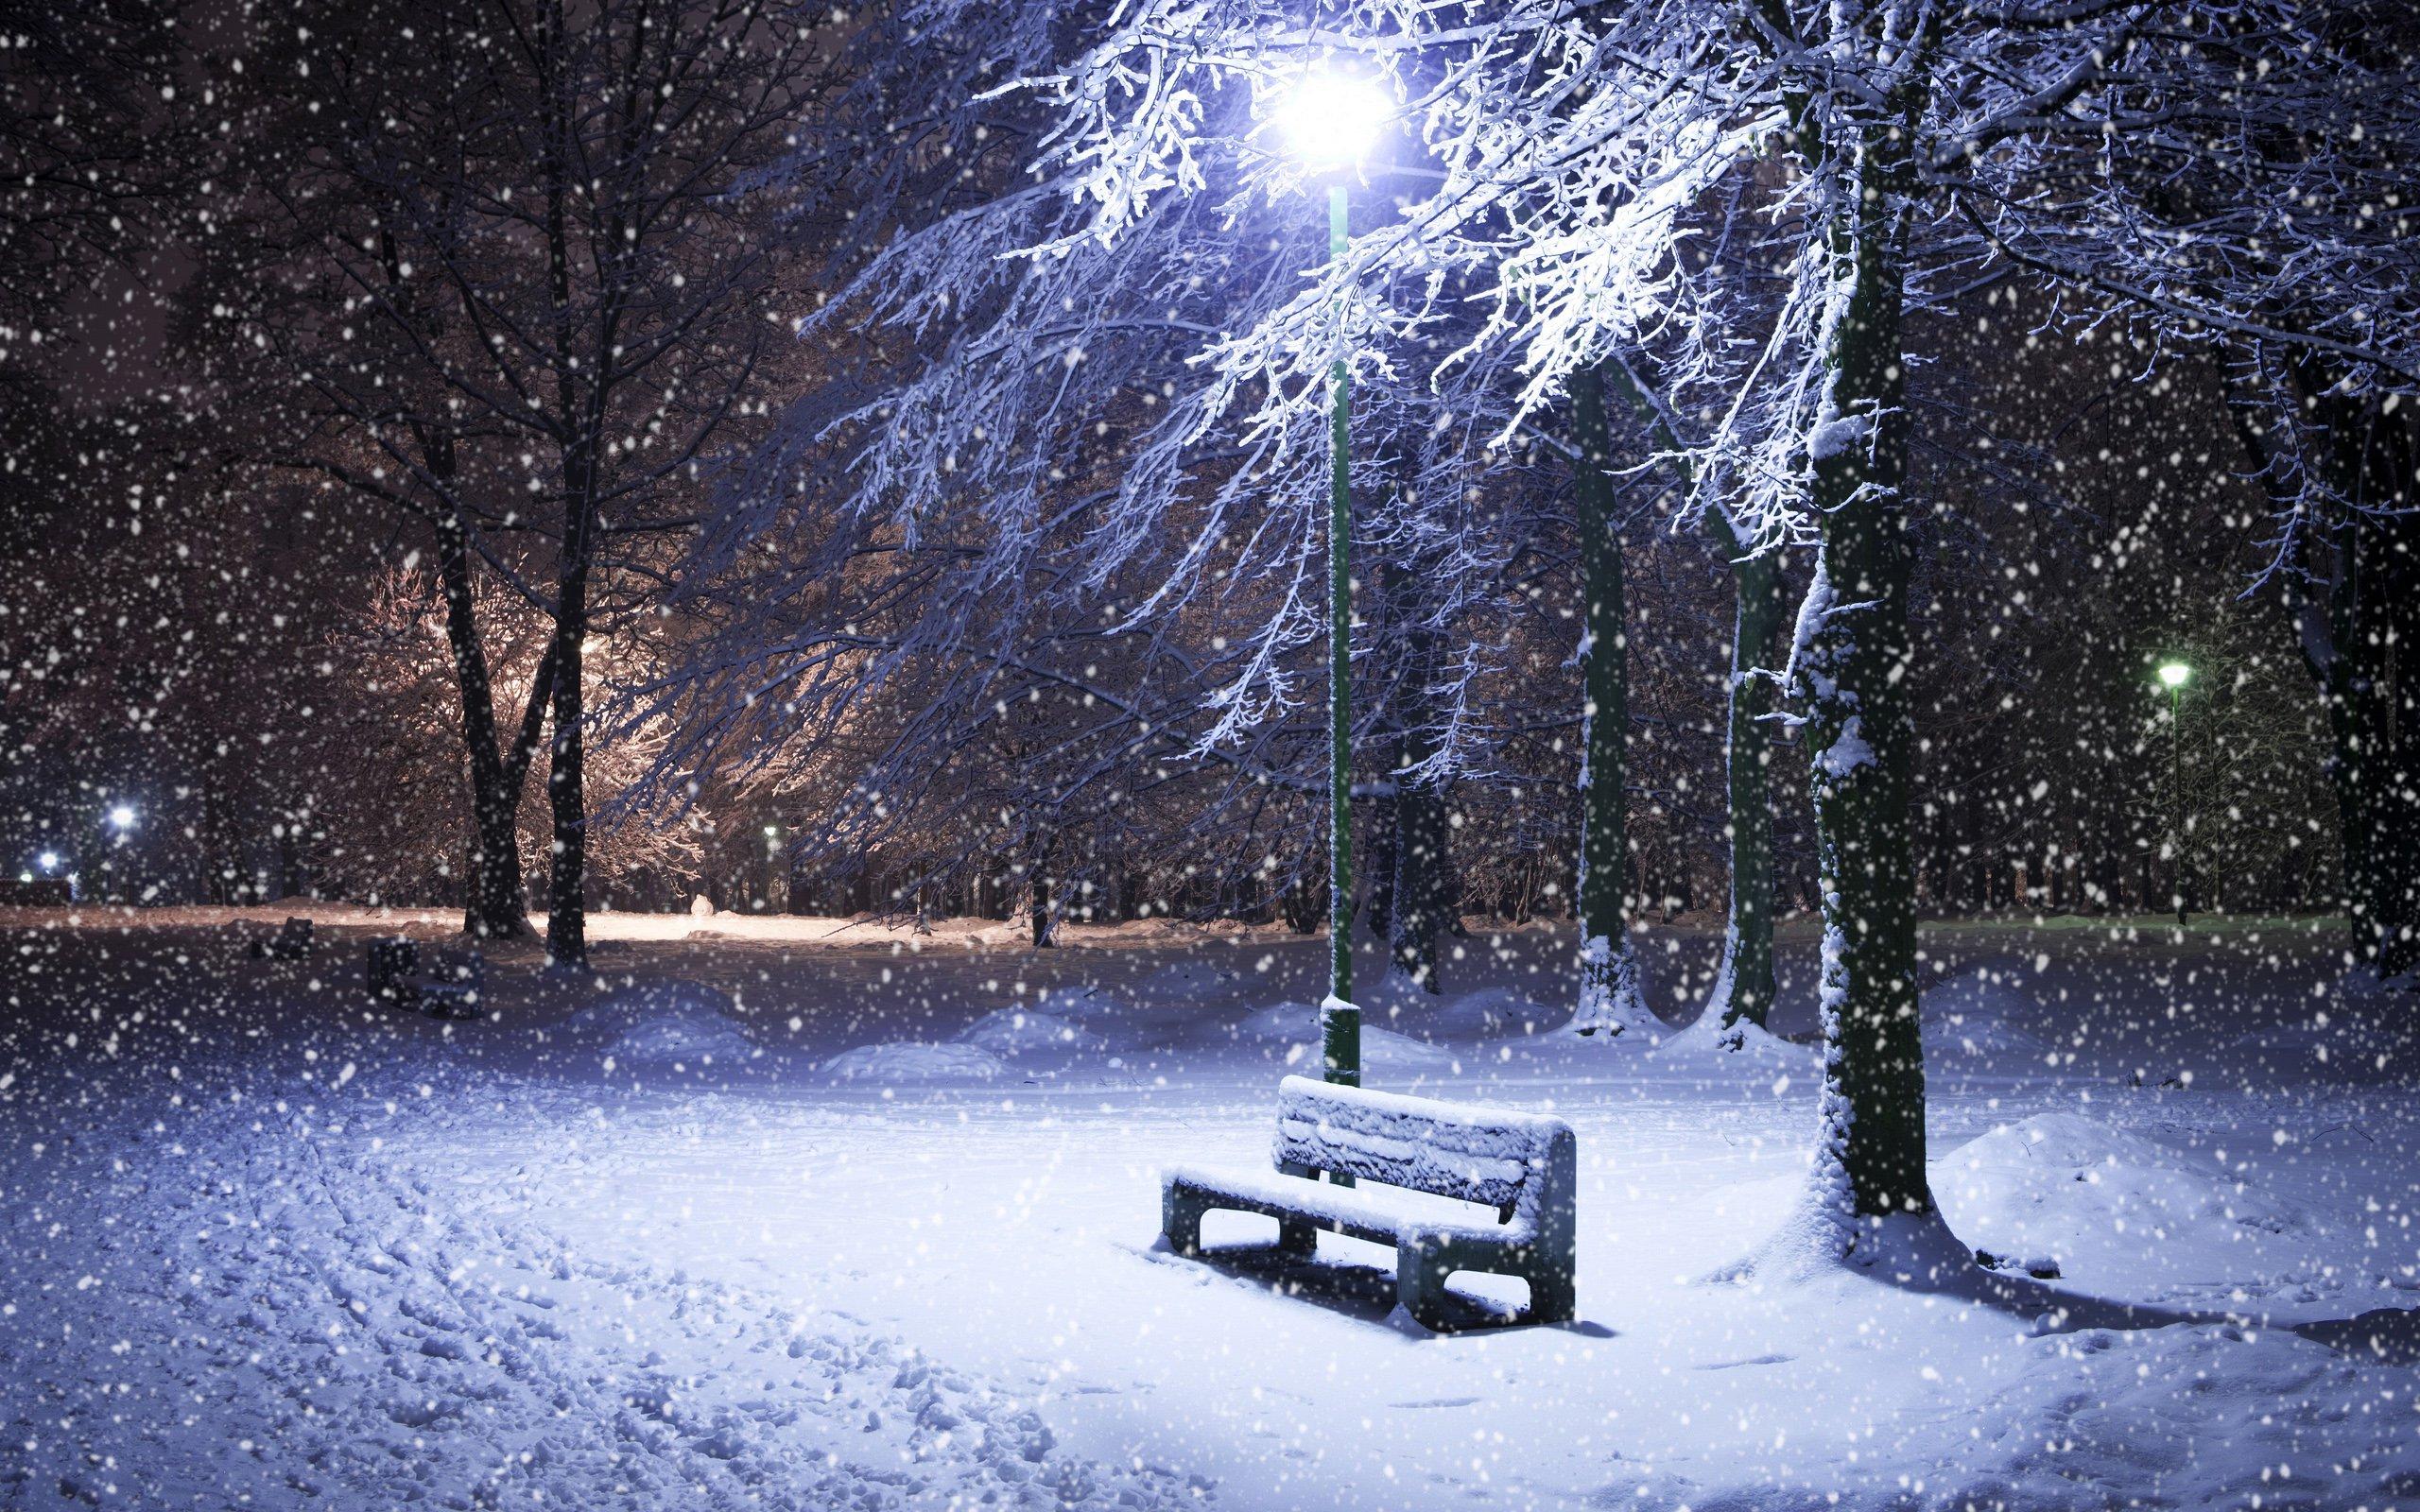 Winter Snow Nature Landscape Wallpaper 2560x1600